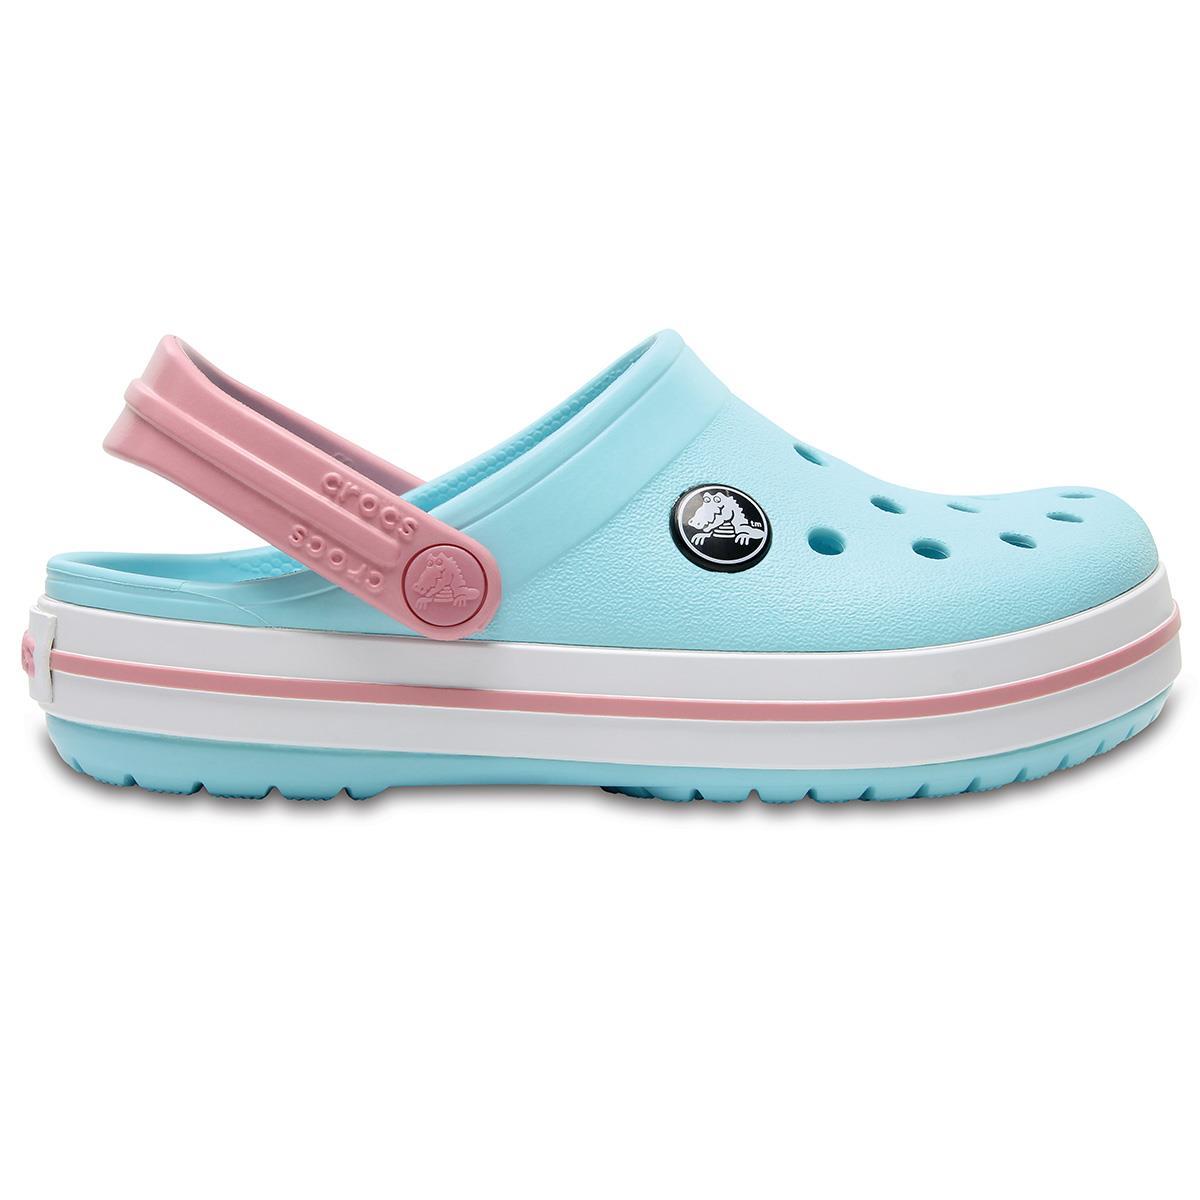 Crocs Crocband Clog K Çocuk Sandalet Cr0384-4S3